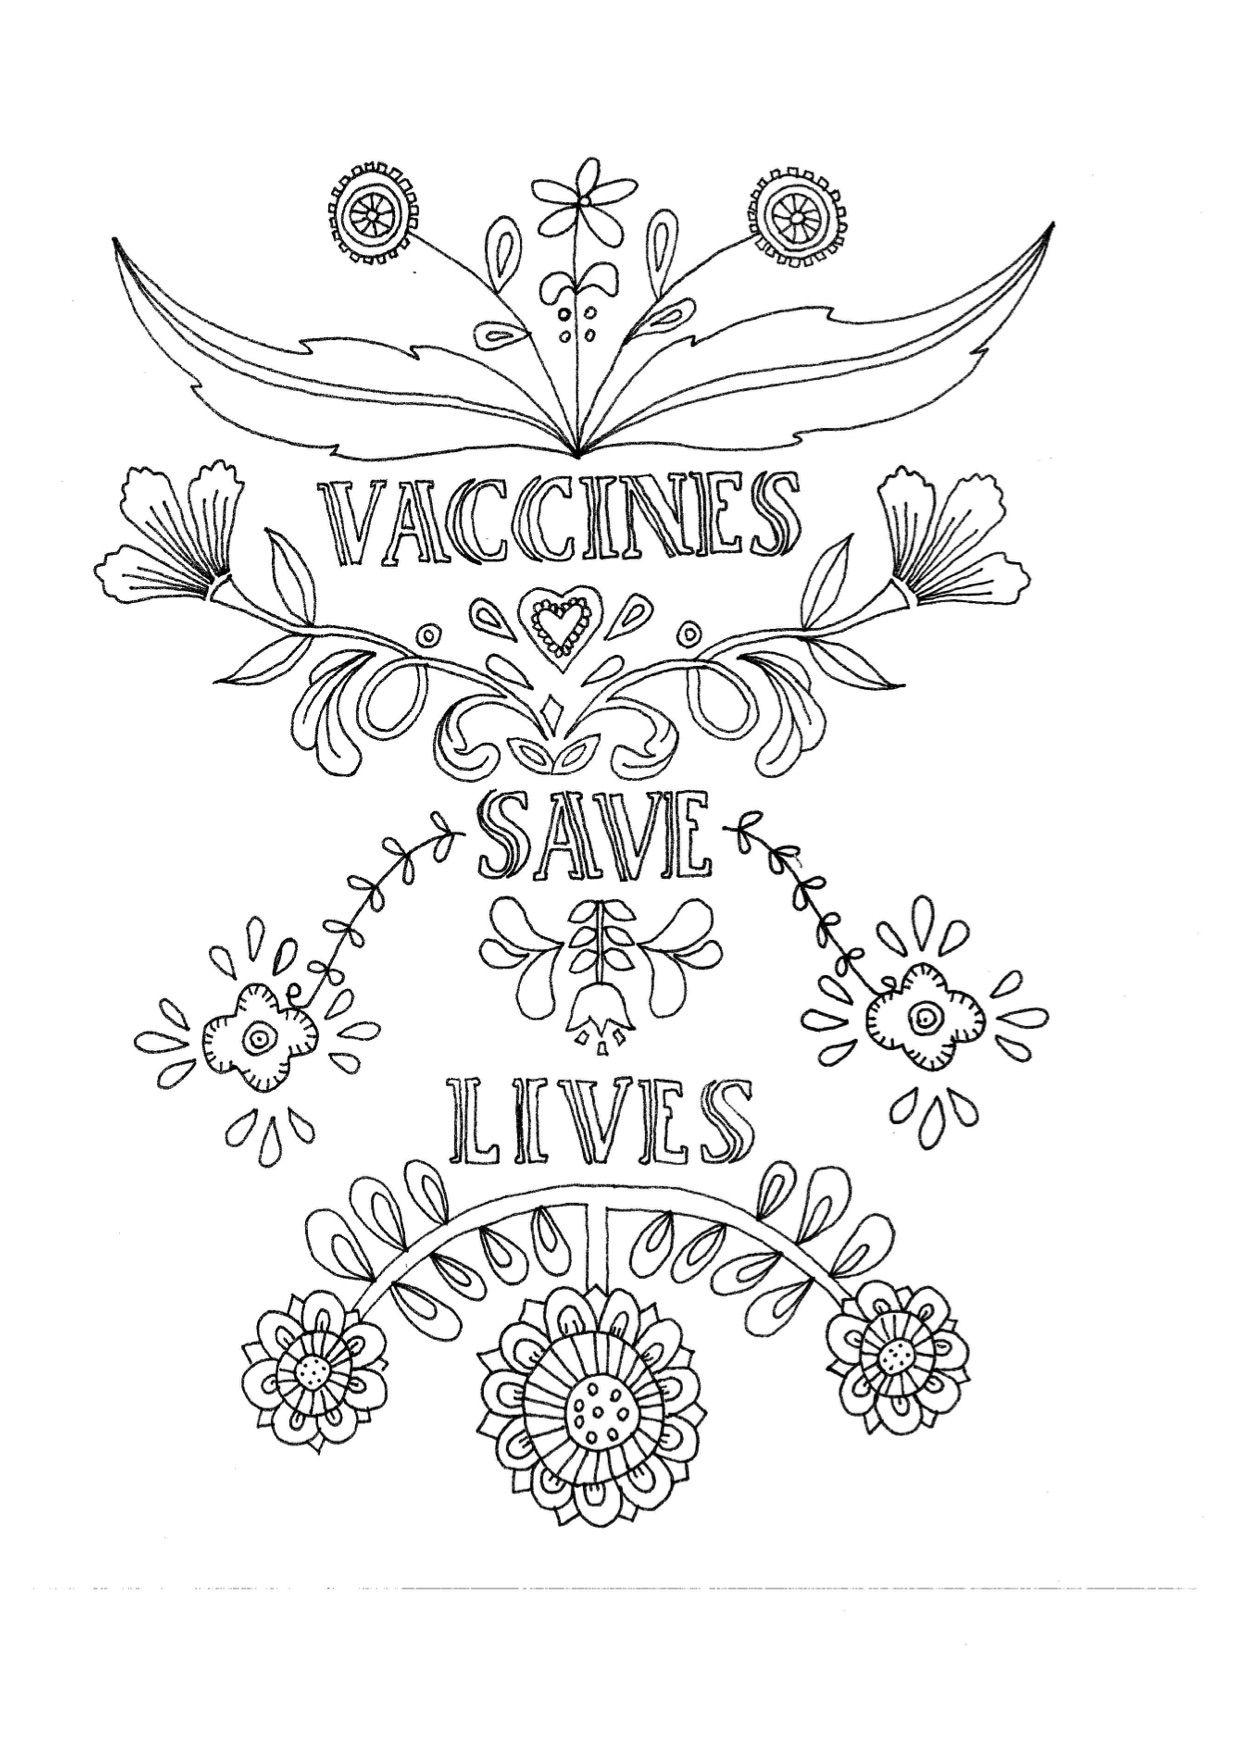 pin on vaccines save lives Pharmacy Technician Resume pro vaccine school nursing res graduate school nurse stuff public health